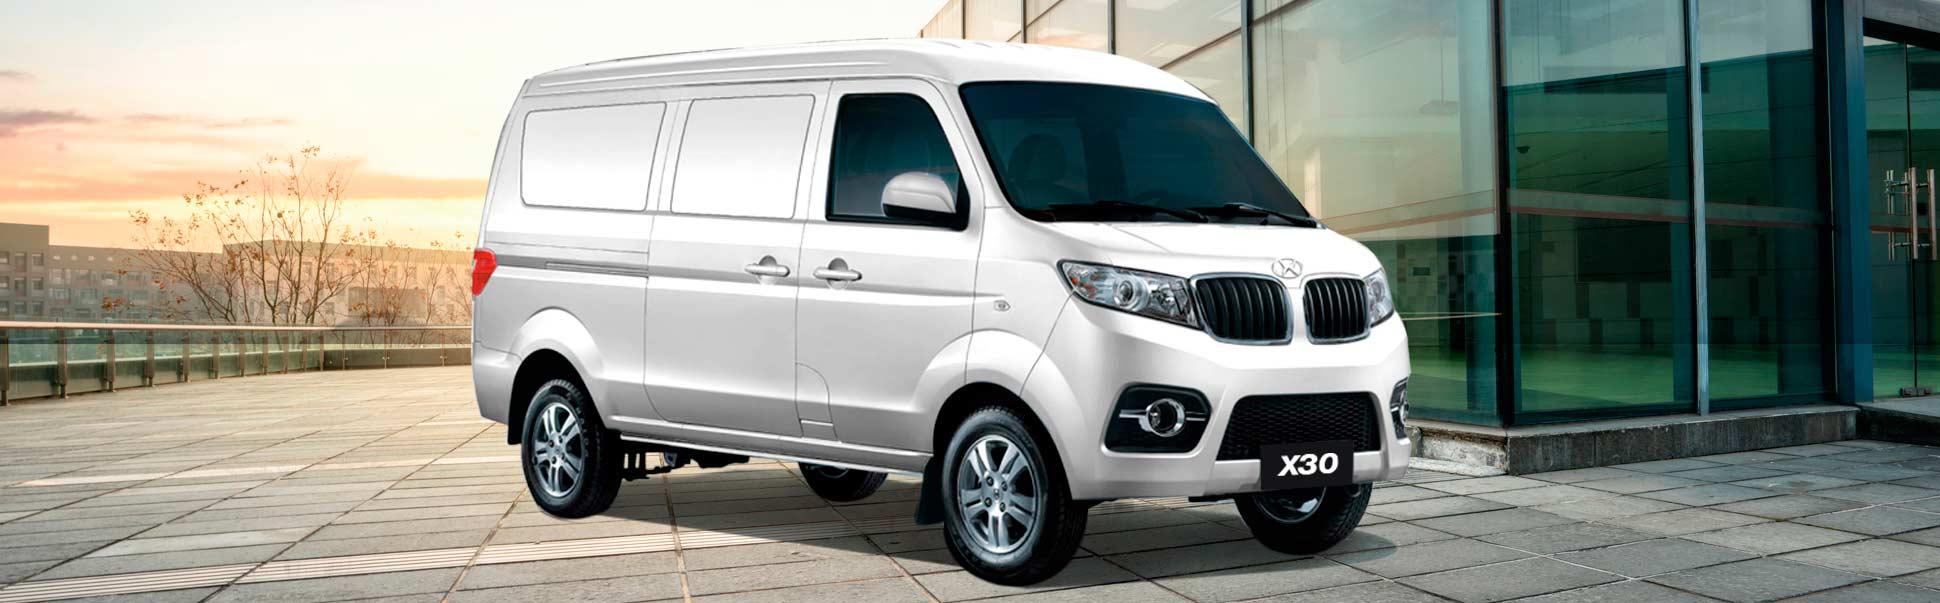 shineray-x30-van-de-carga-blanca-carretera